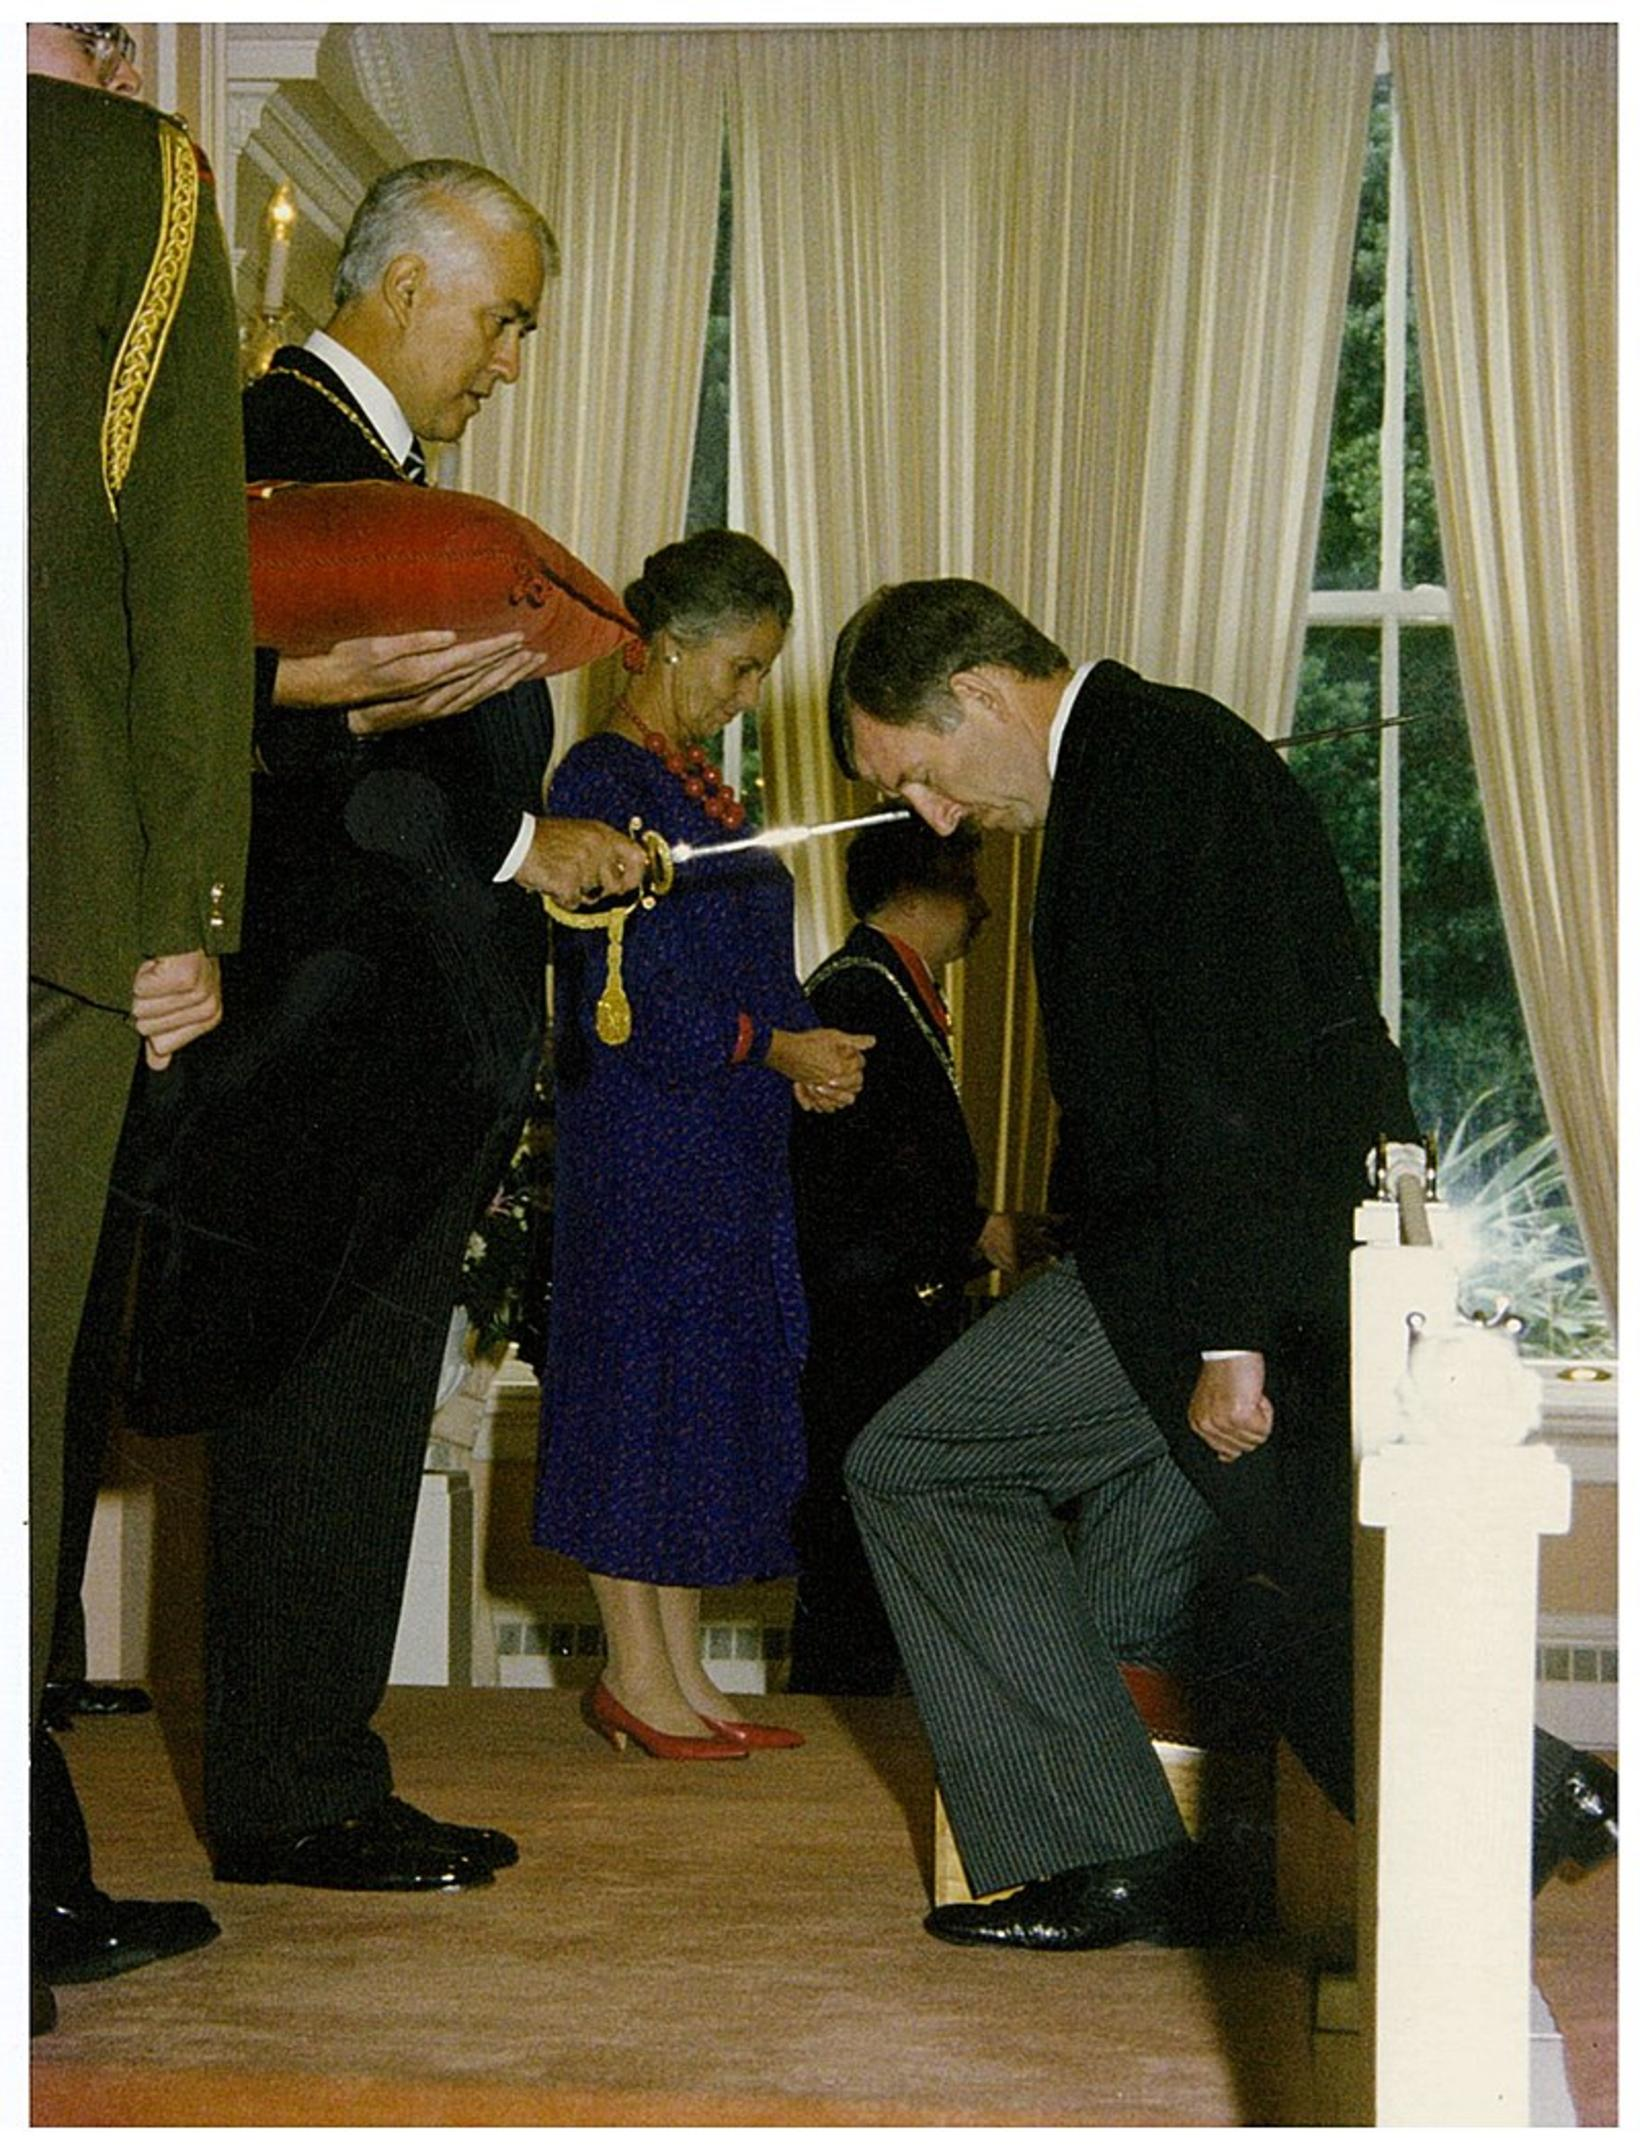 Sir Paul Reeves aðlar Sir Ron Brierley í maí 1988.